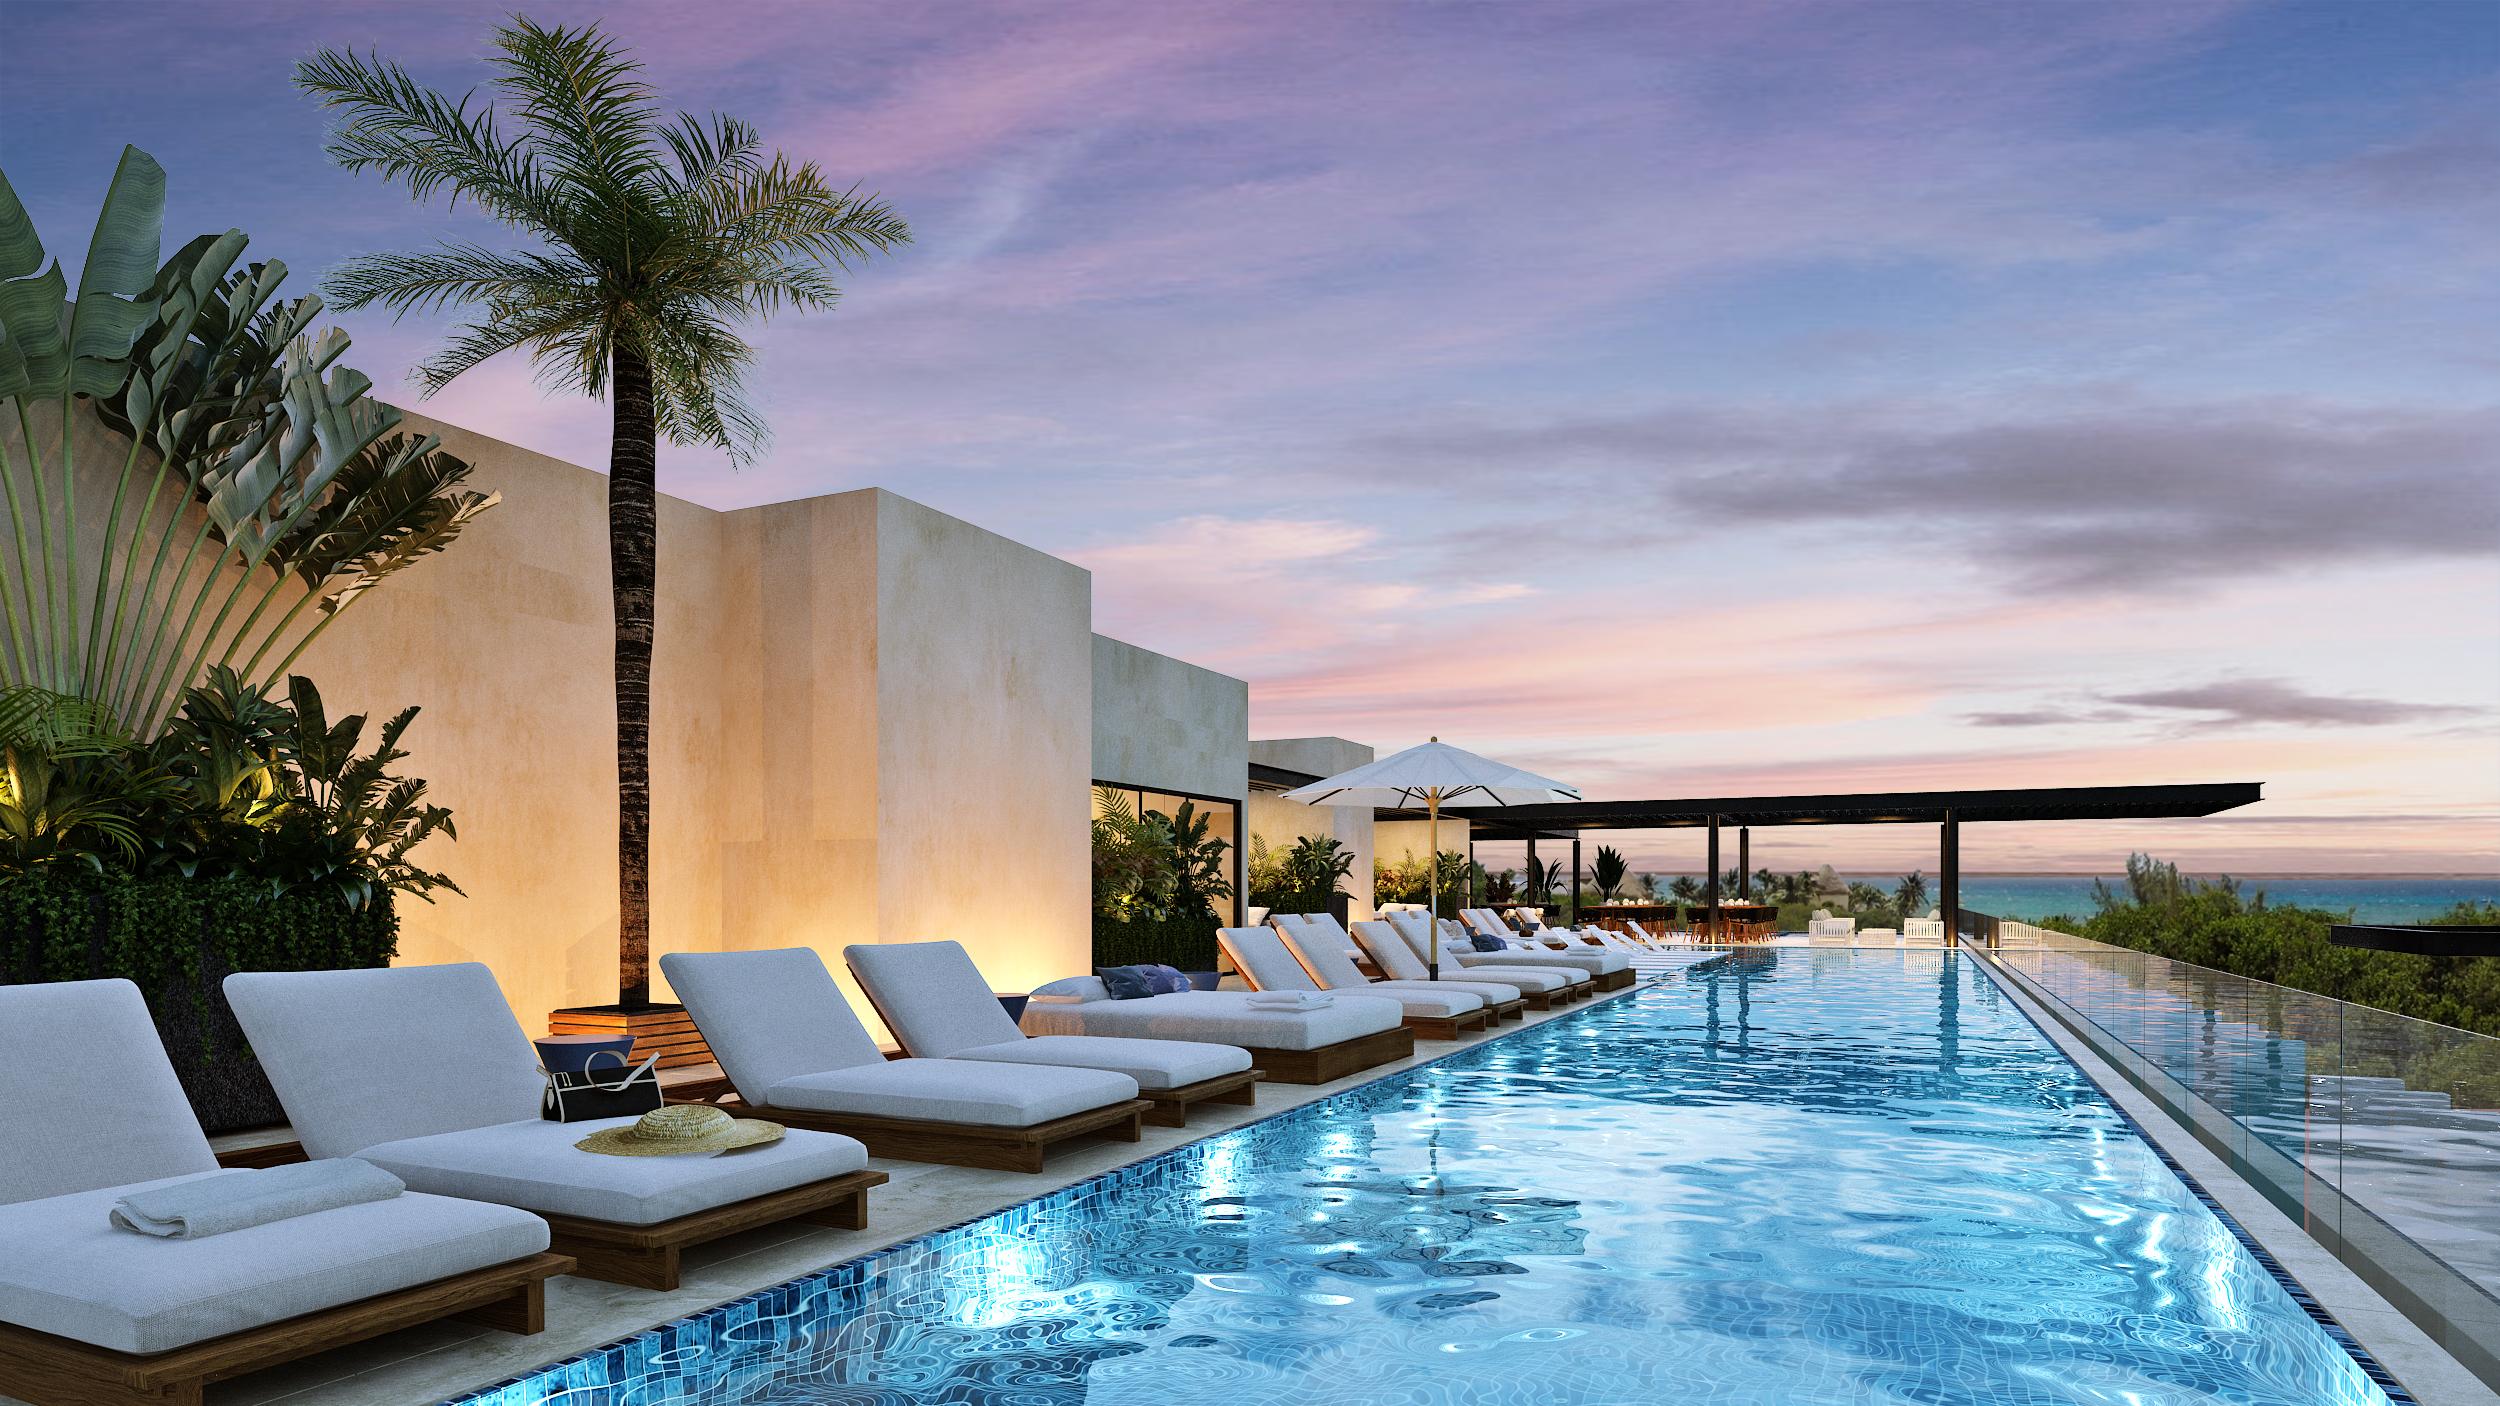 Playa del Carmen rooftops mls 21165